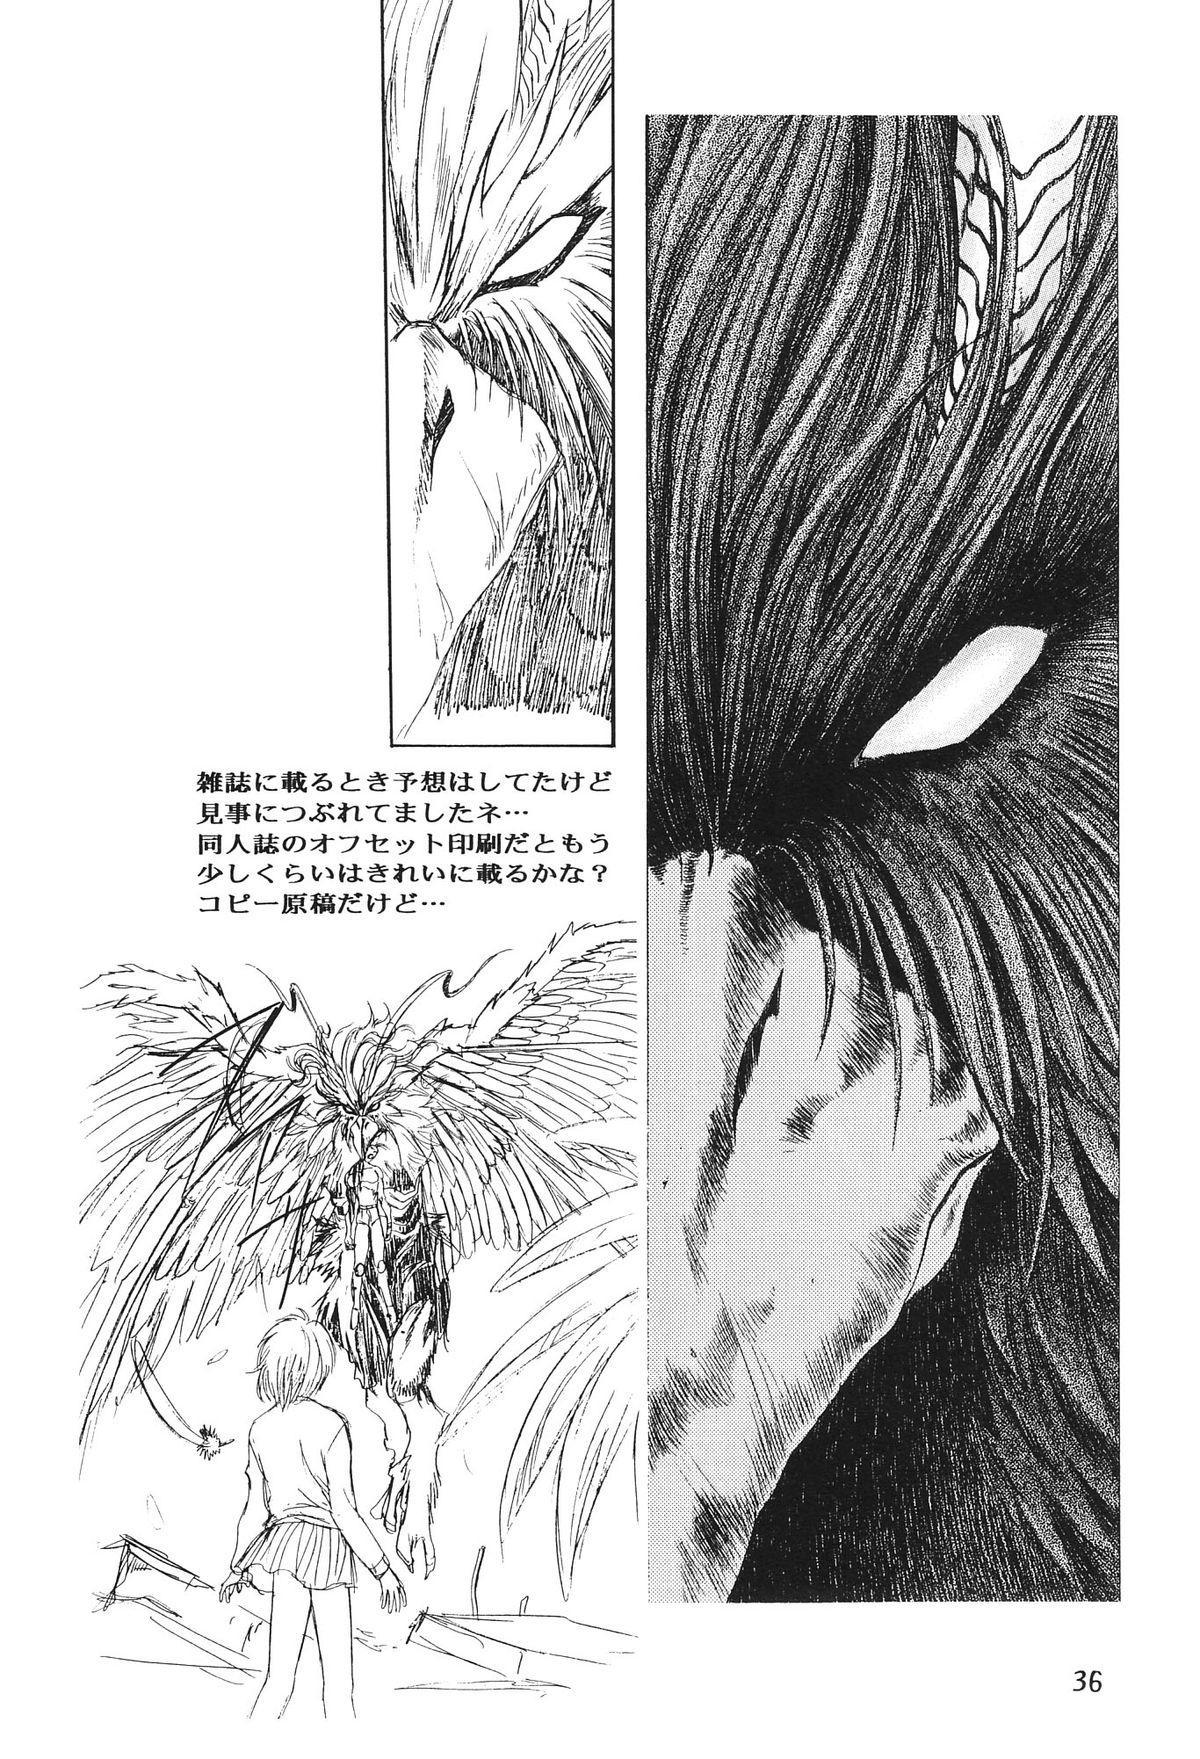 Henrei-kai '98 Natsu SPECIAL 37